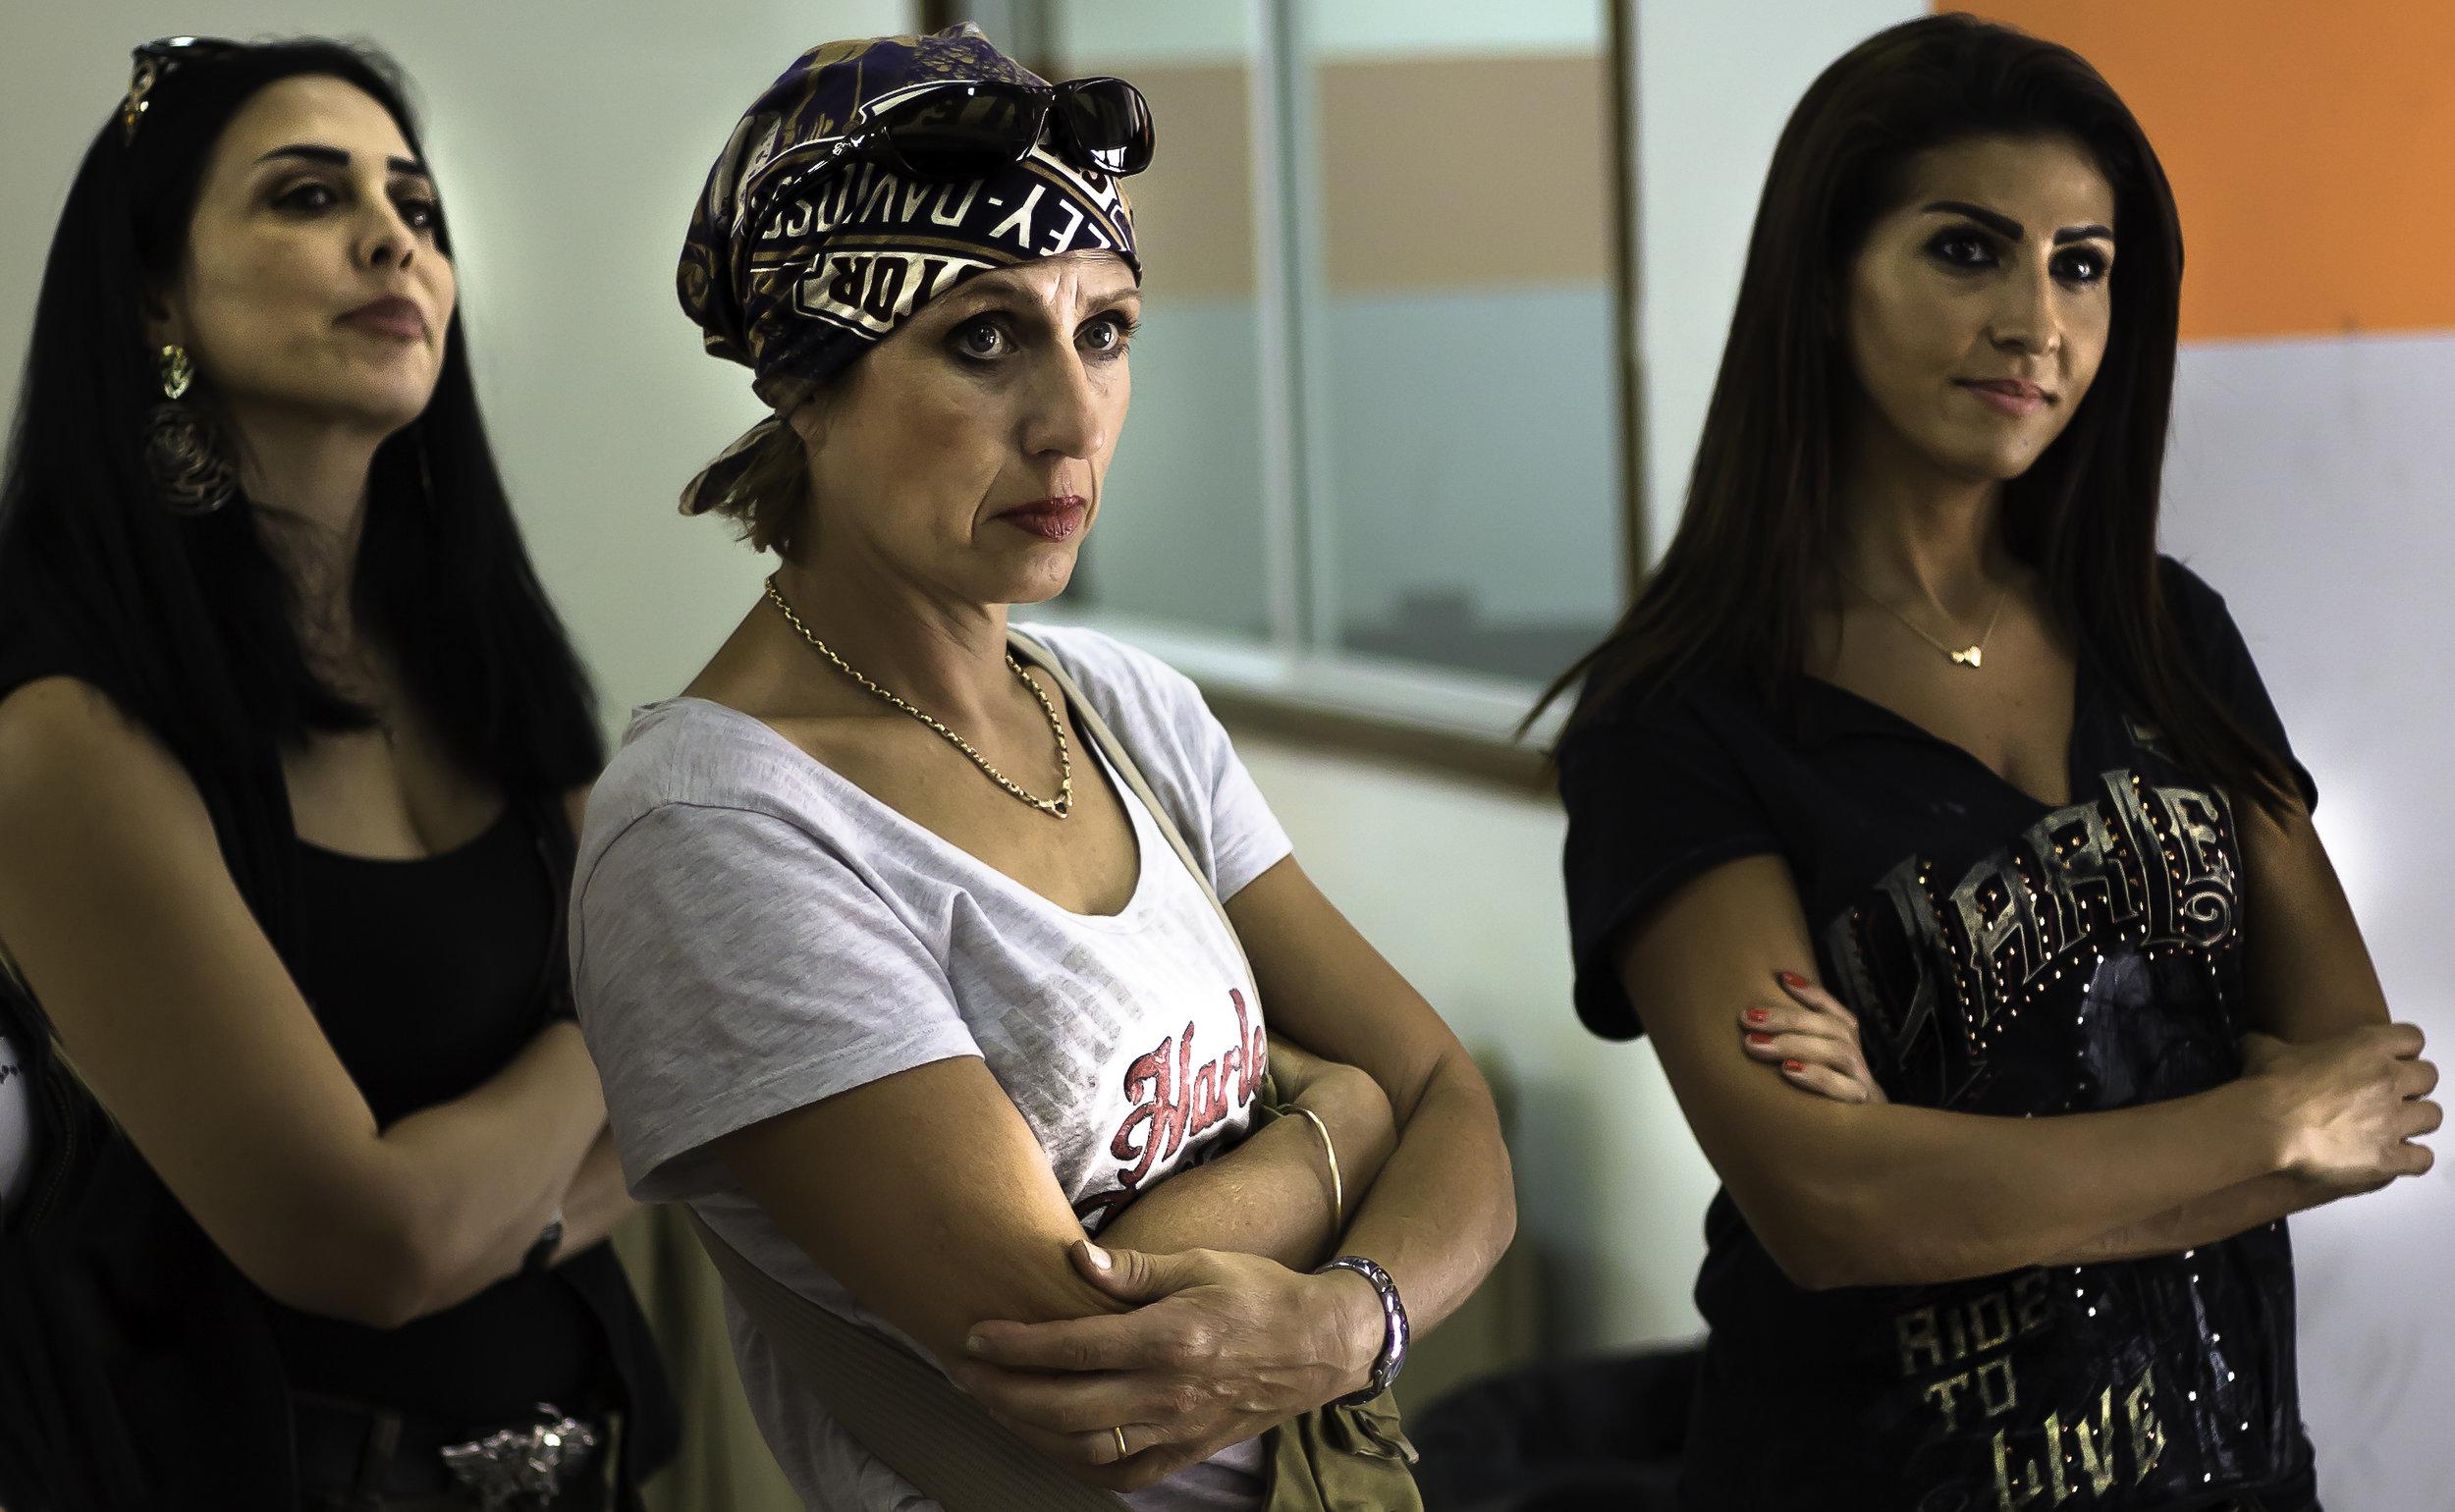 Dubai women bikers at a Harley Davidson Garage Party learn about motorcylce care.jpg